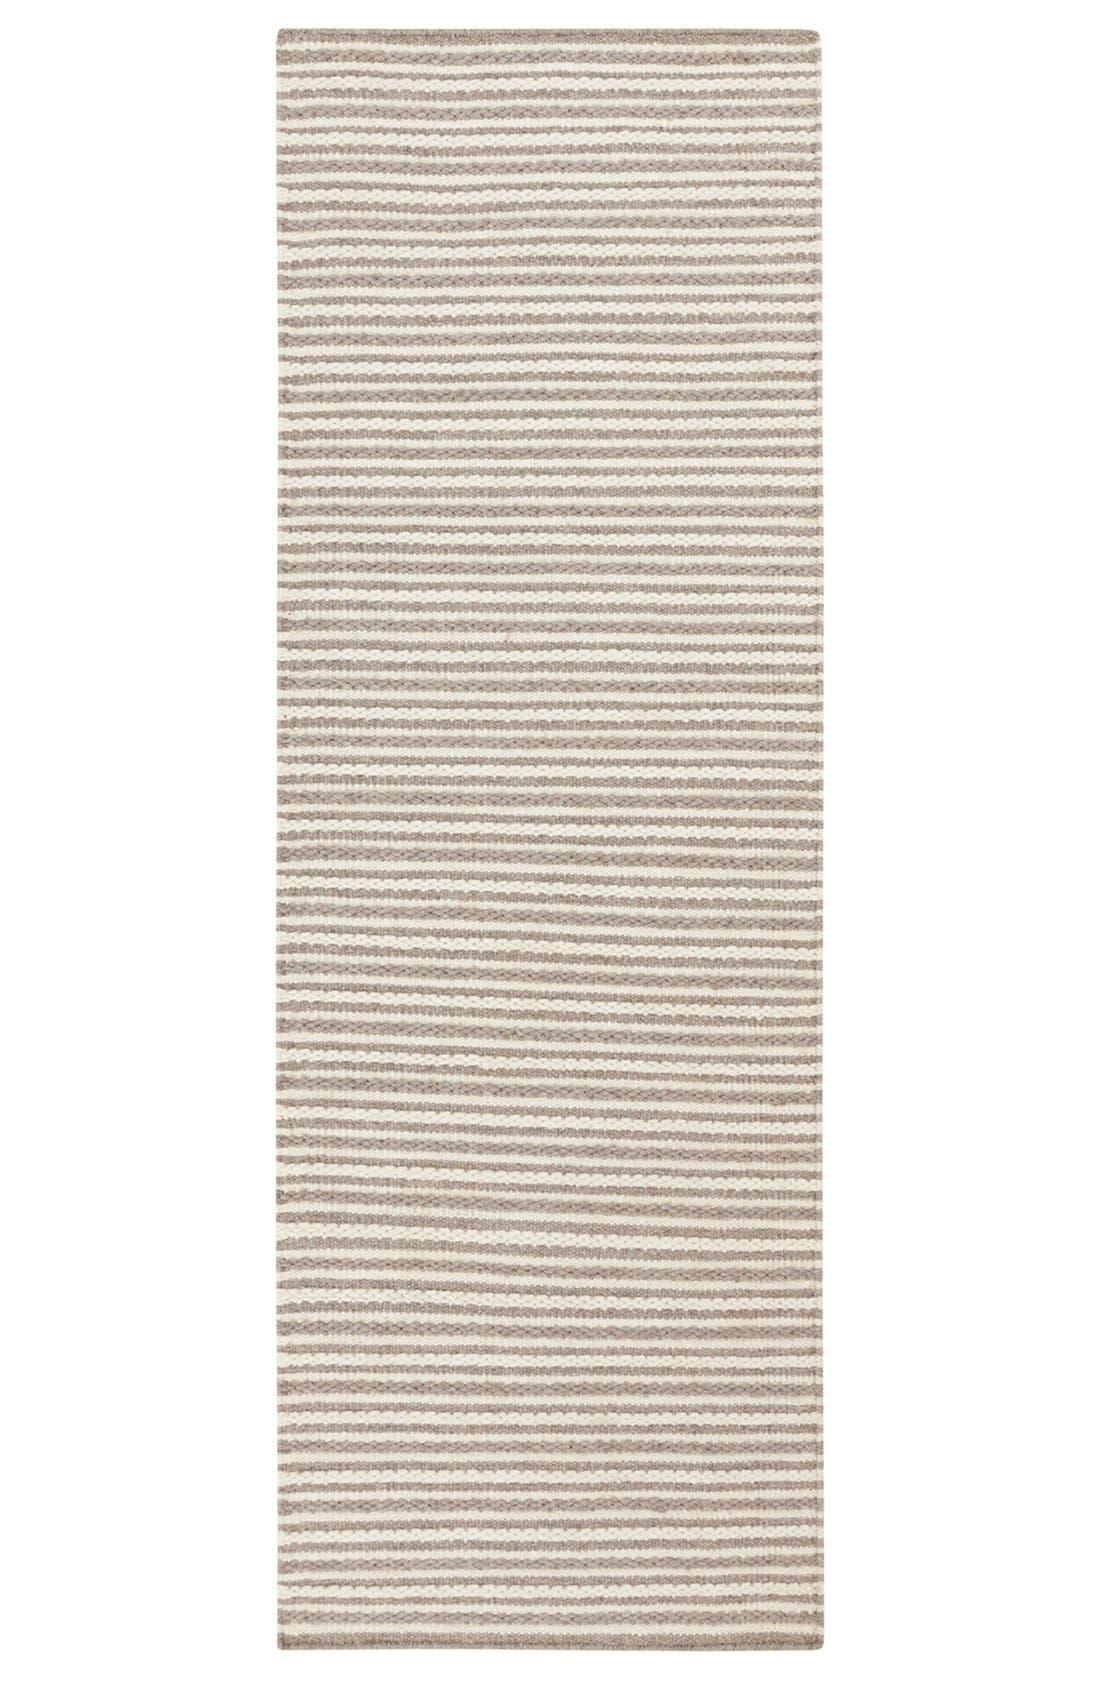 'Ravena' Wool Rug,                             Alternate thumbnail 2, color,                             Ivory/ Taupe